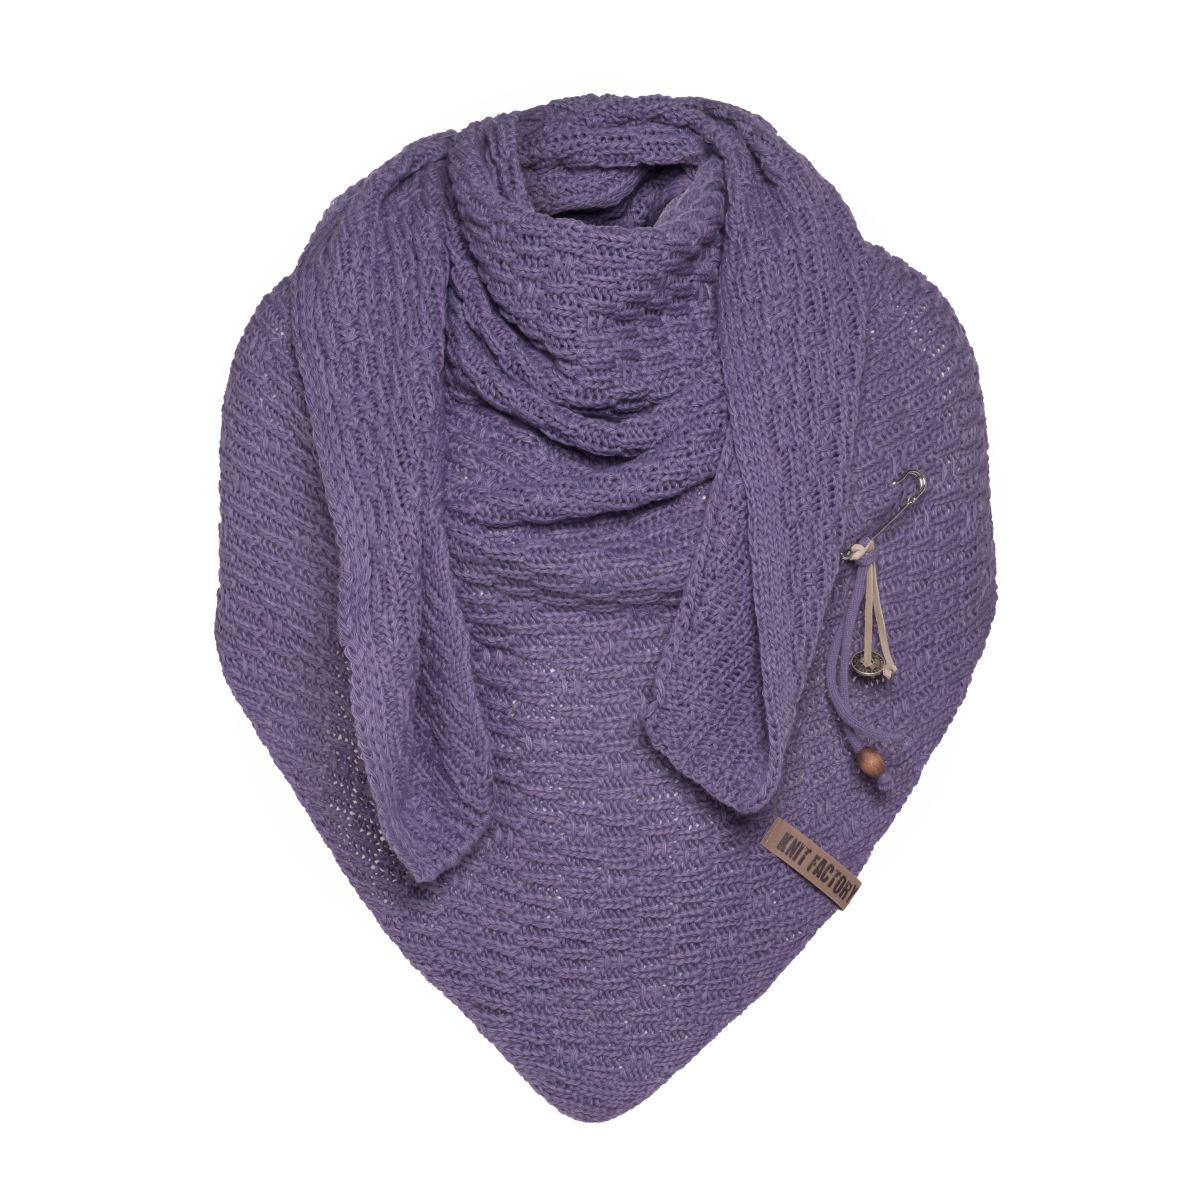 jaida omslagdoek violet